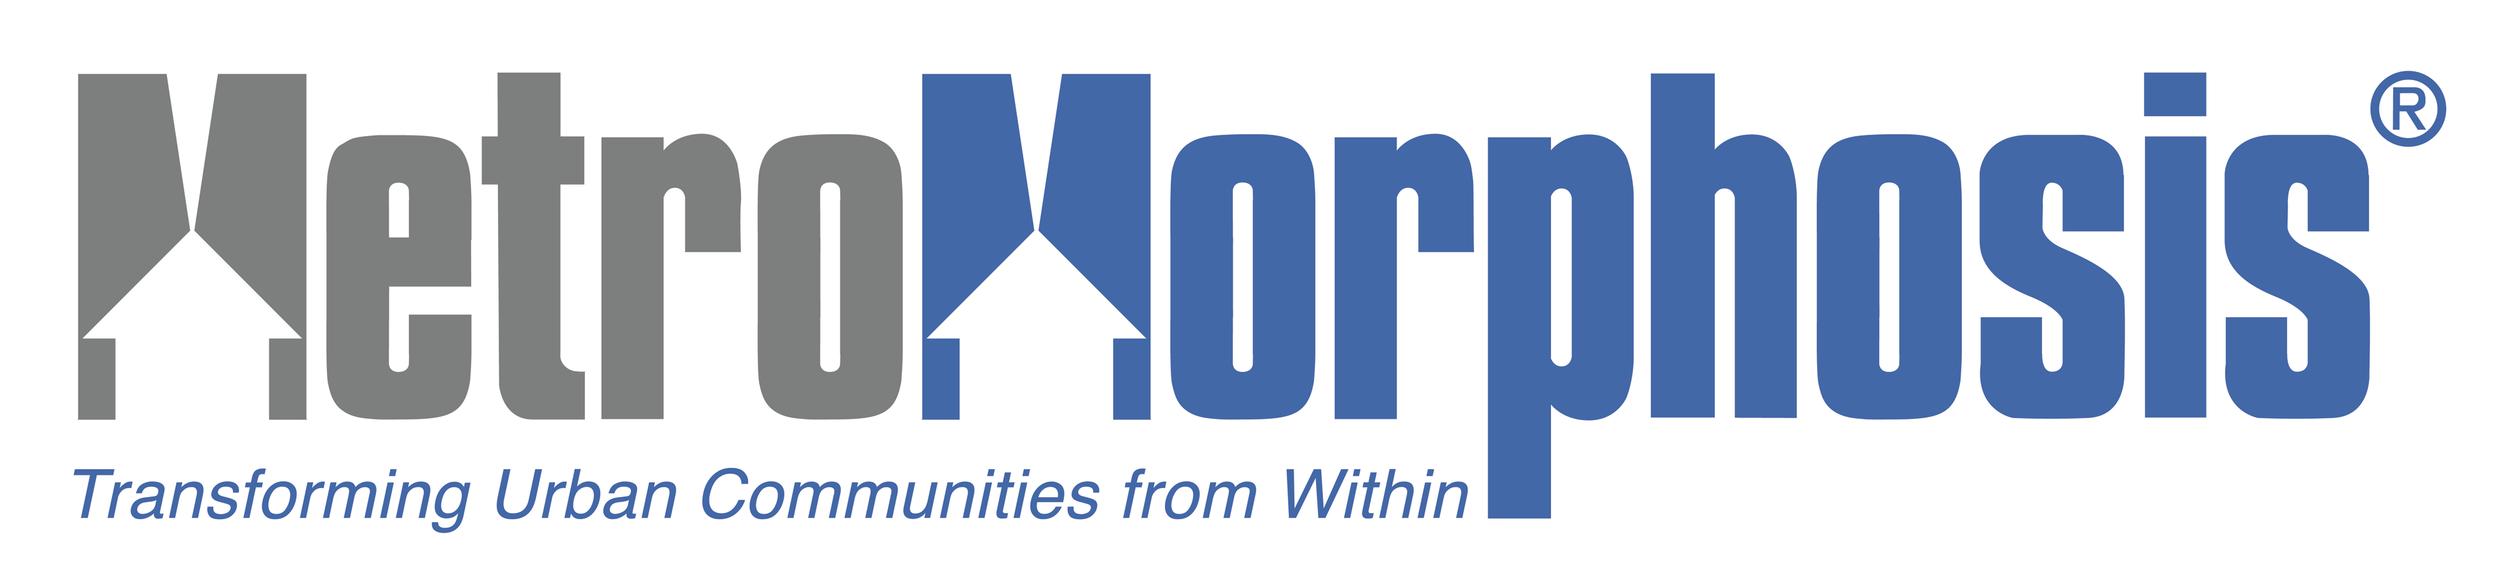 MetroMorphosis-Vector-Logo-01.png